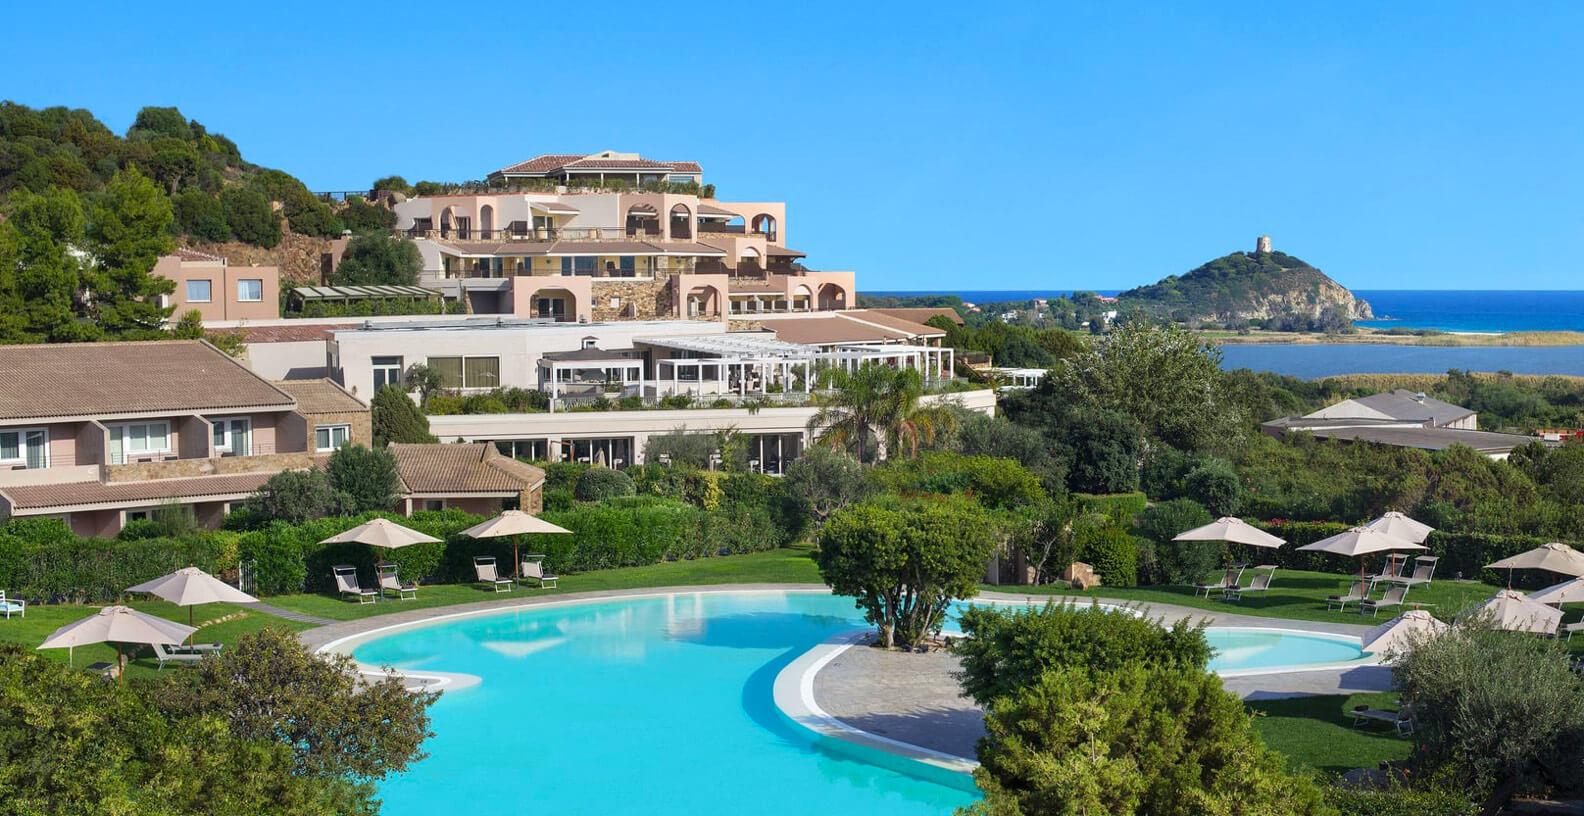 Conrad Laguna hotel Sardinia